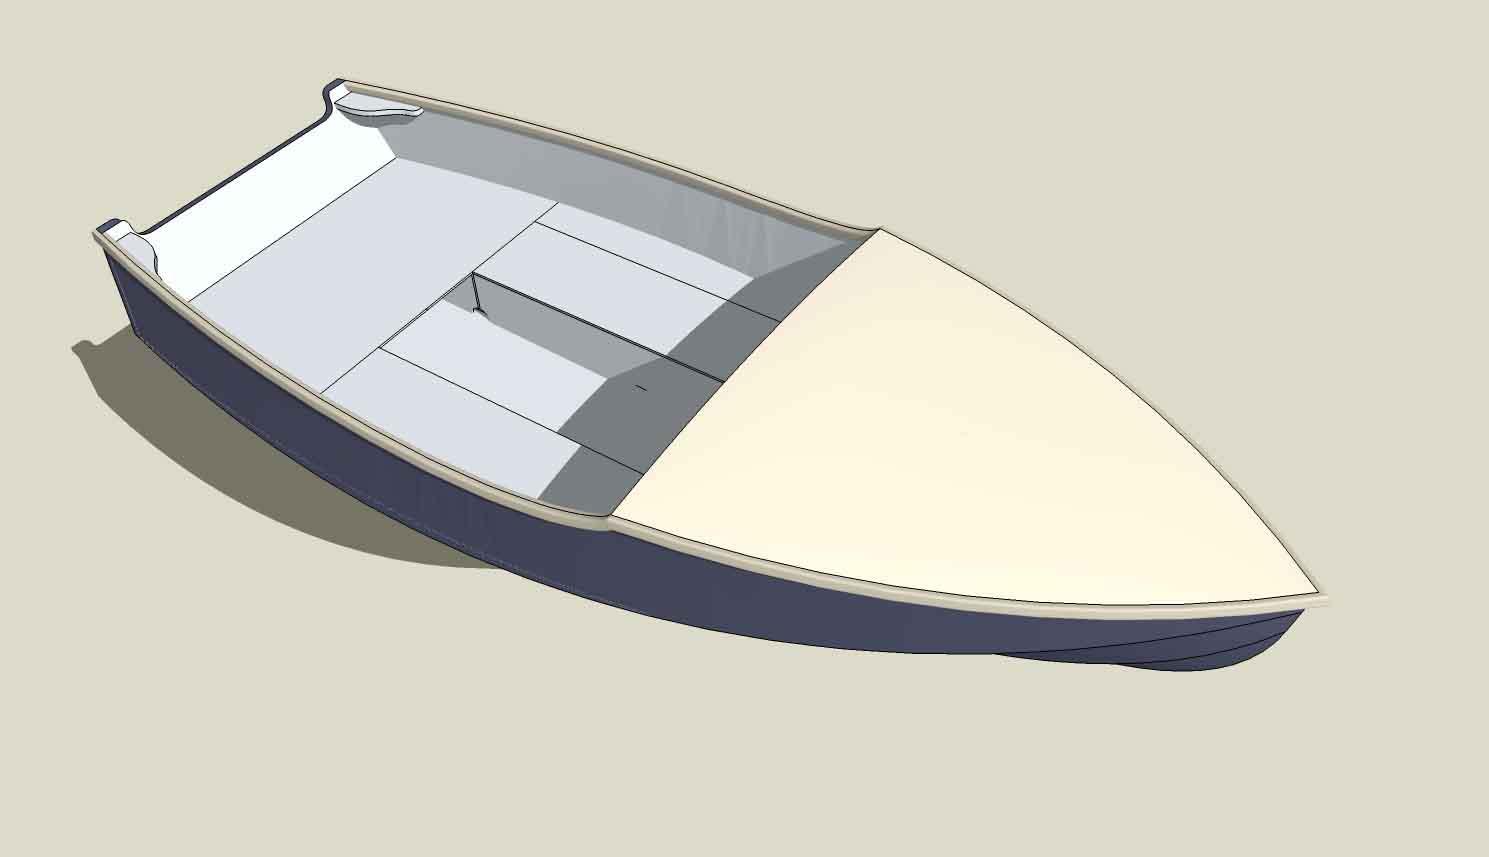 1 DRAWINGS boat only 6 jun 13 - Scene 11.jpg